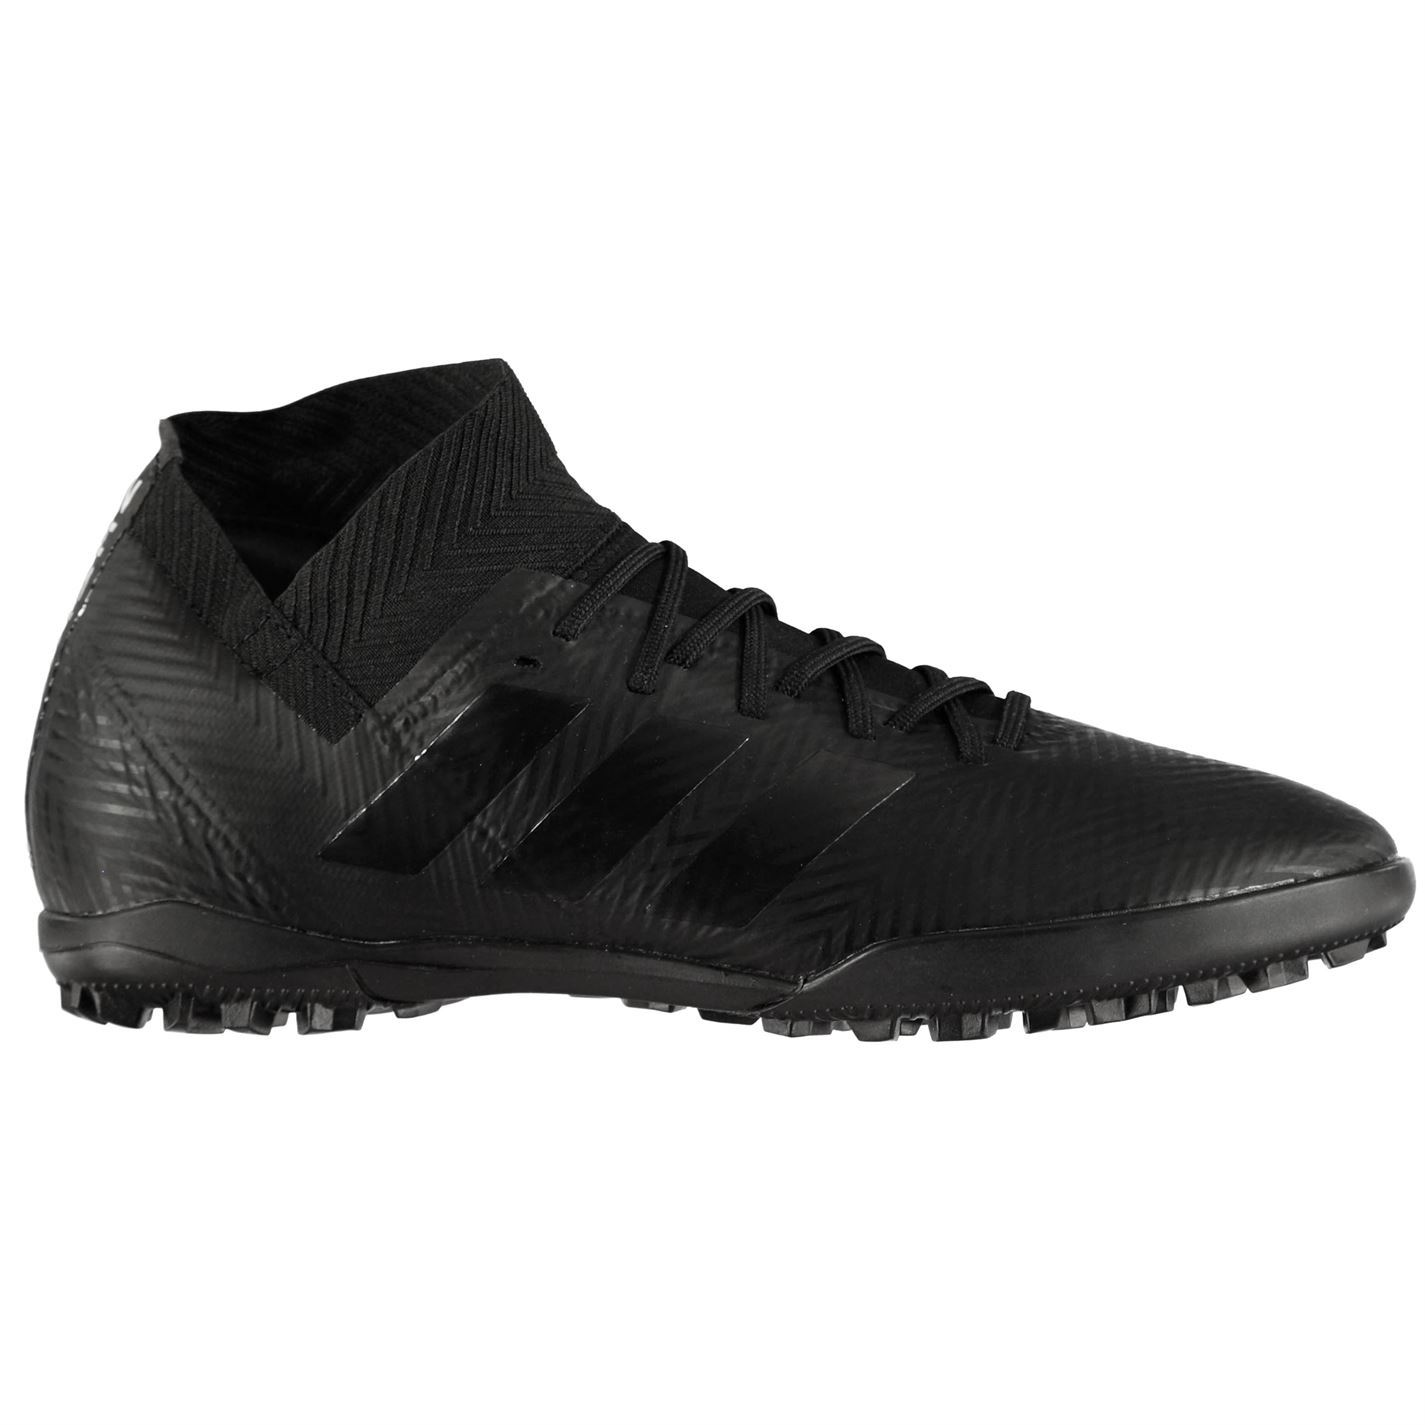 f5903632d ... adidas Nemeziz Tango 18.3 Astro Turf Football Trainers Mens Black  Soccer Shoes ...